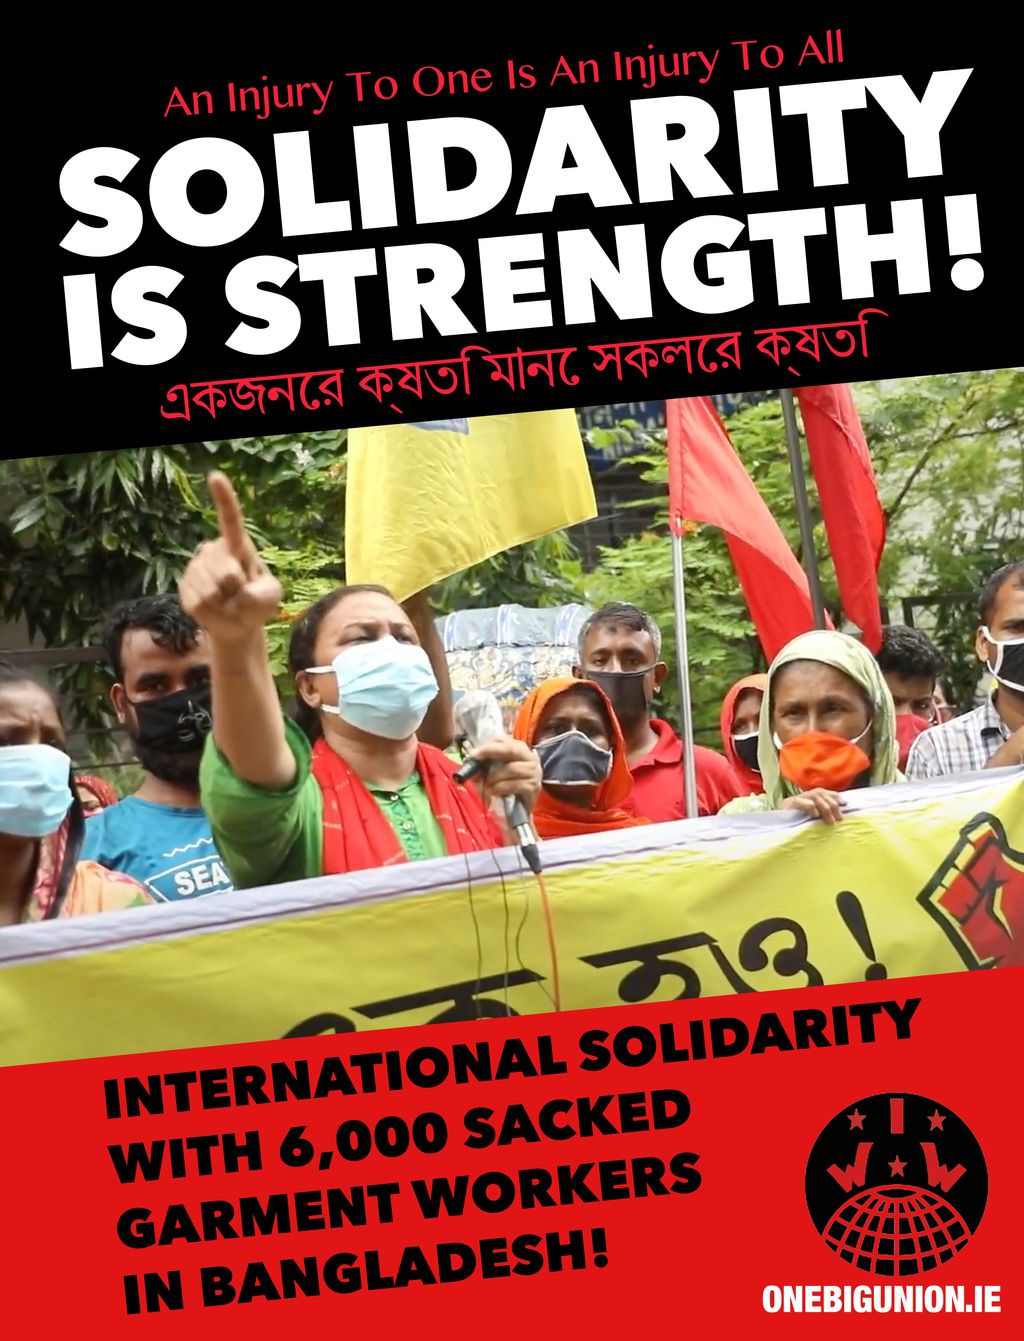 Solidarity with BangladeshiWorkers